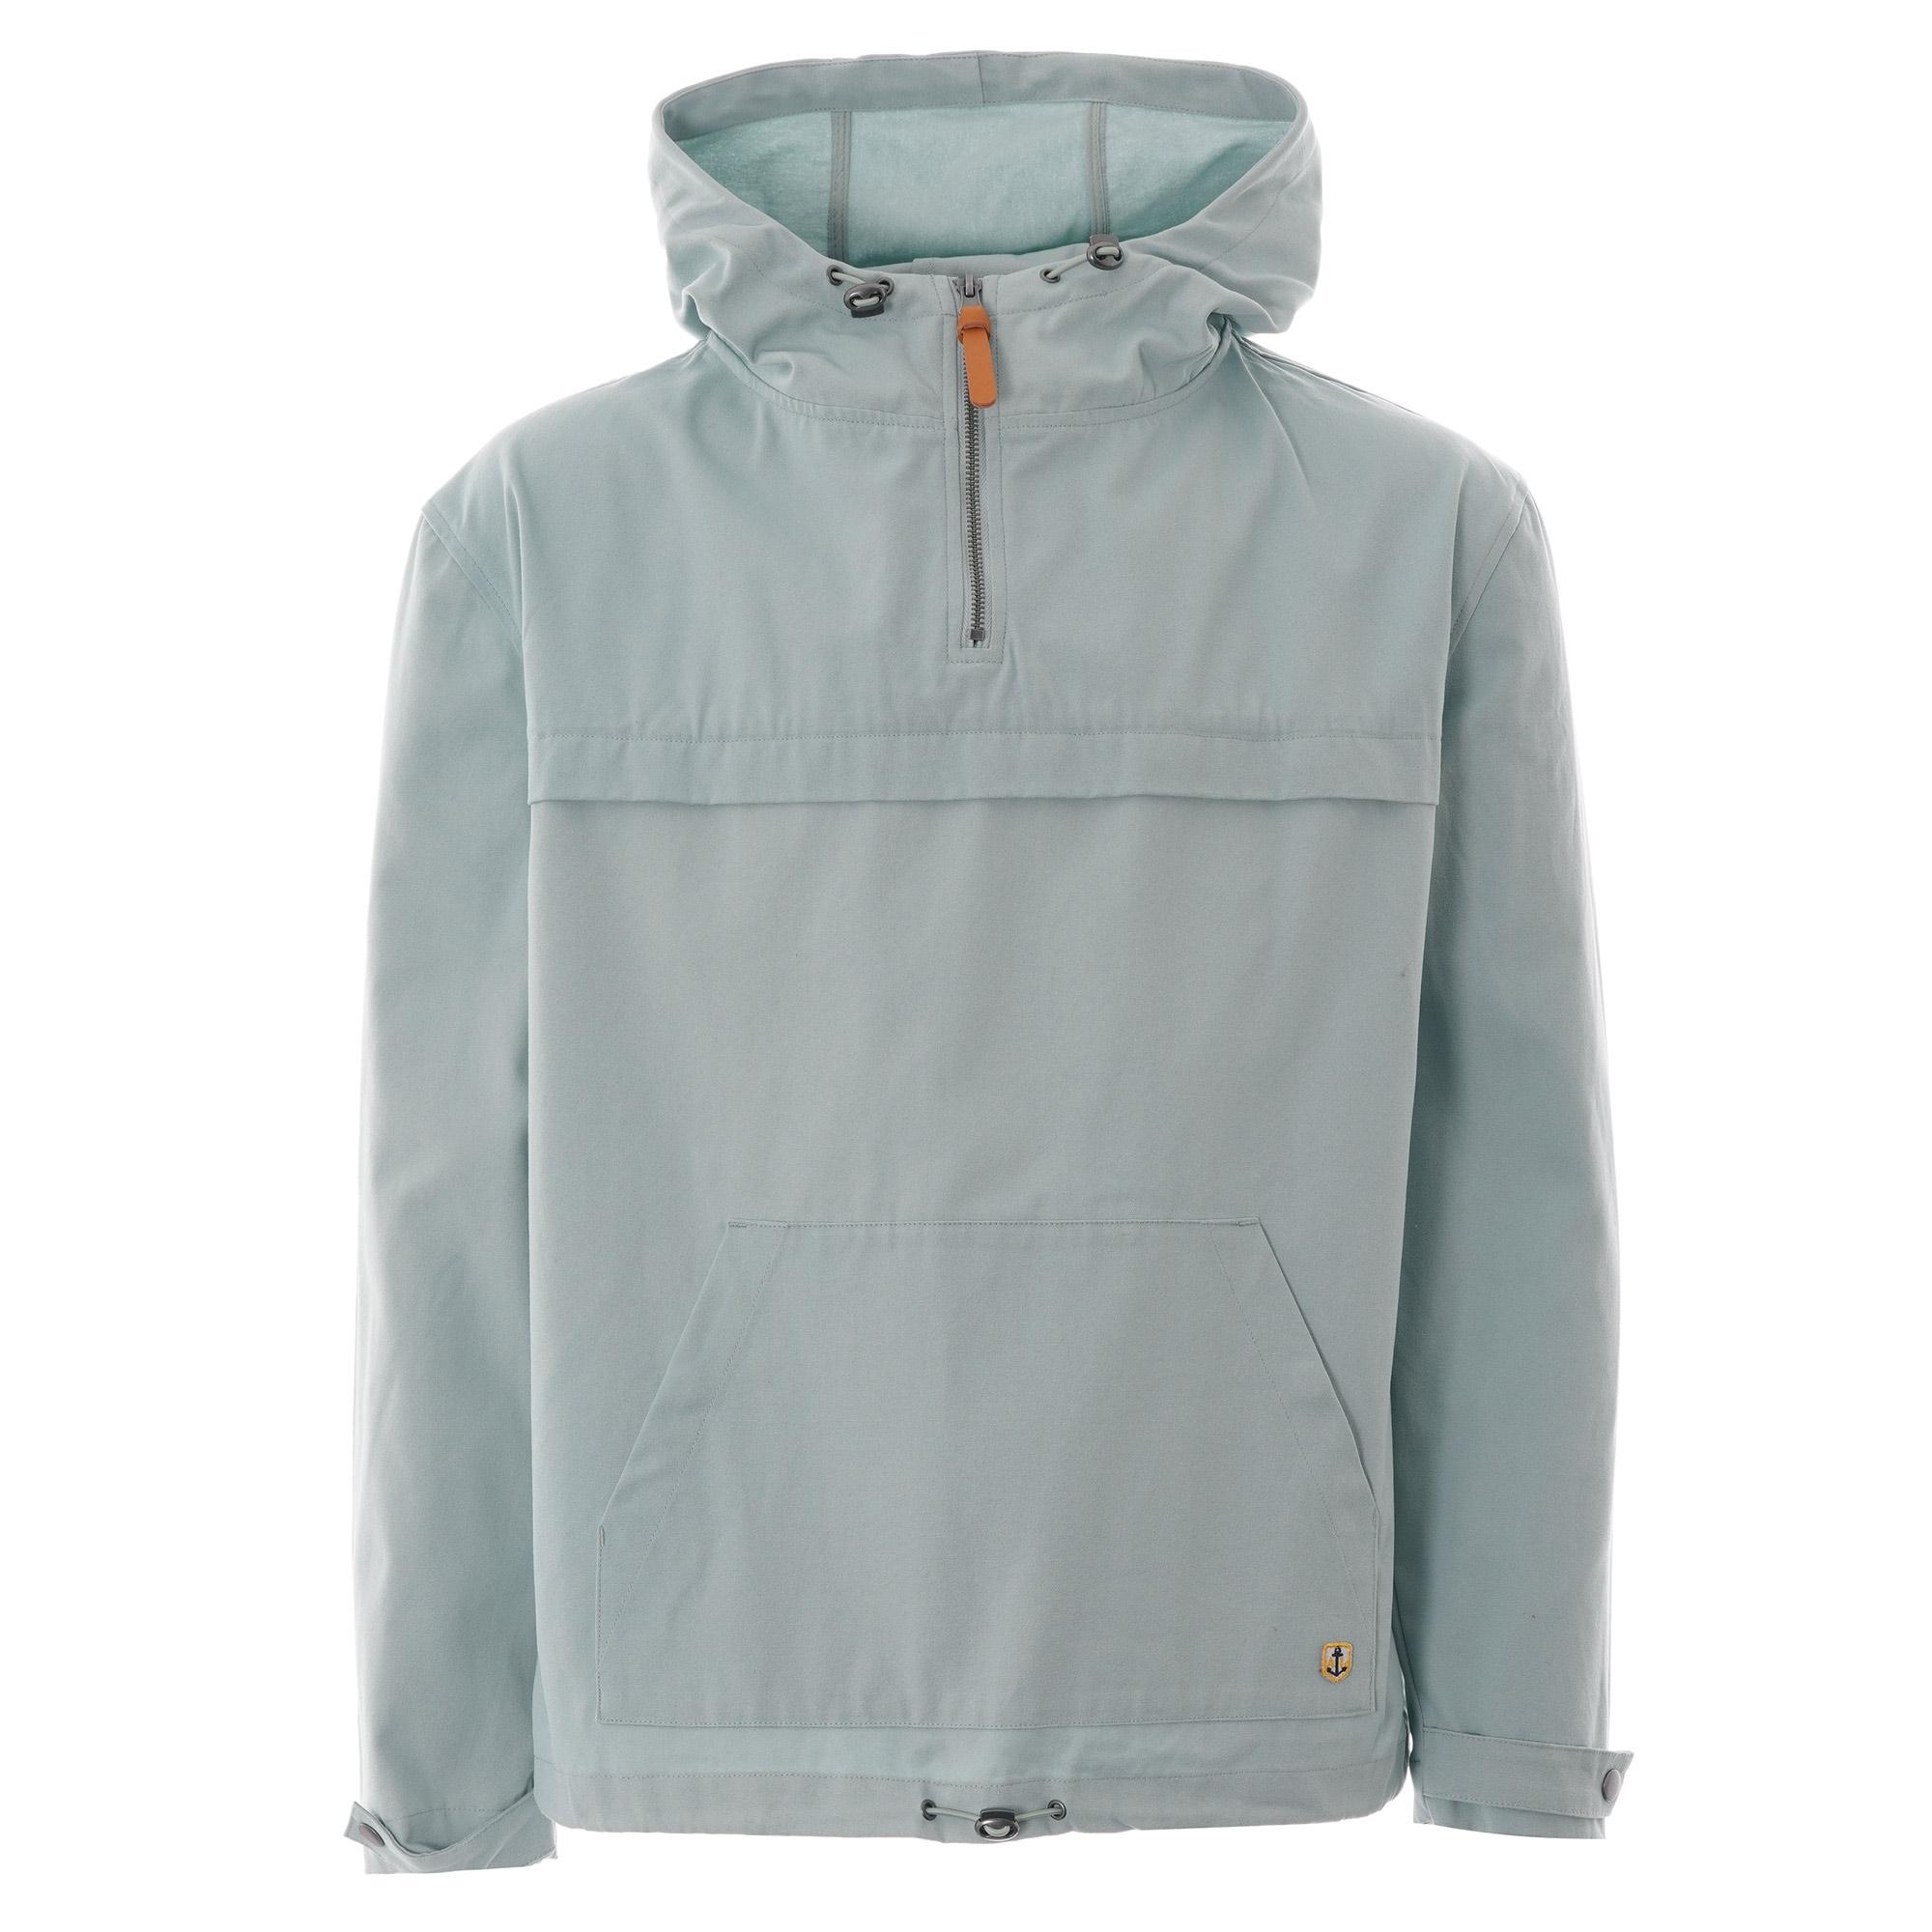 Armor Lux Jacket